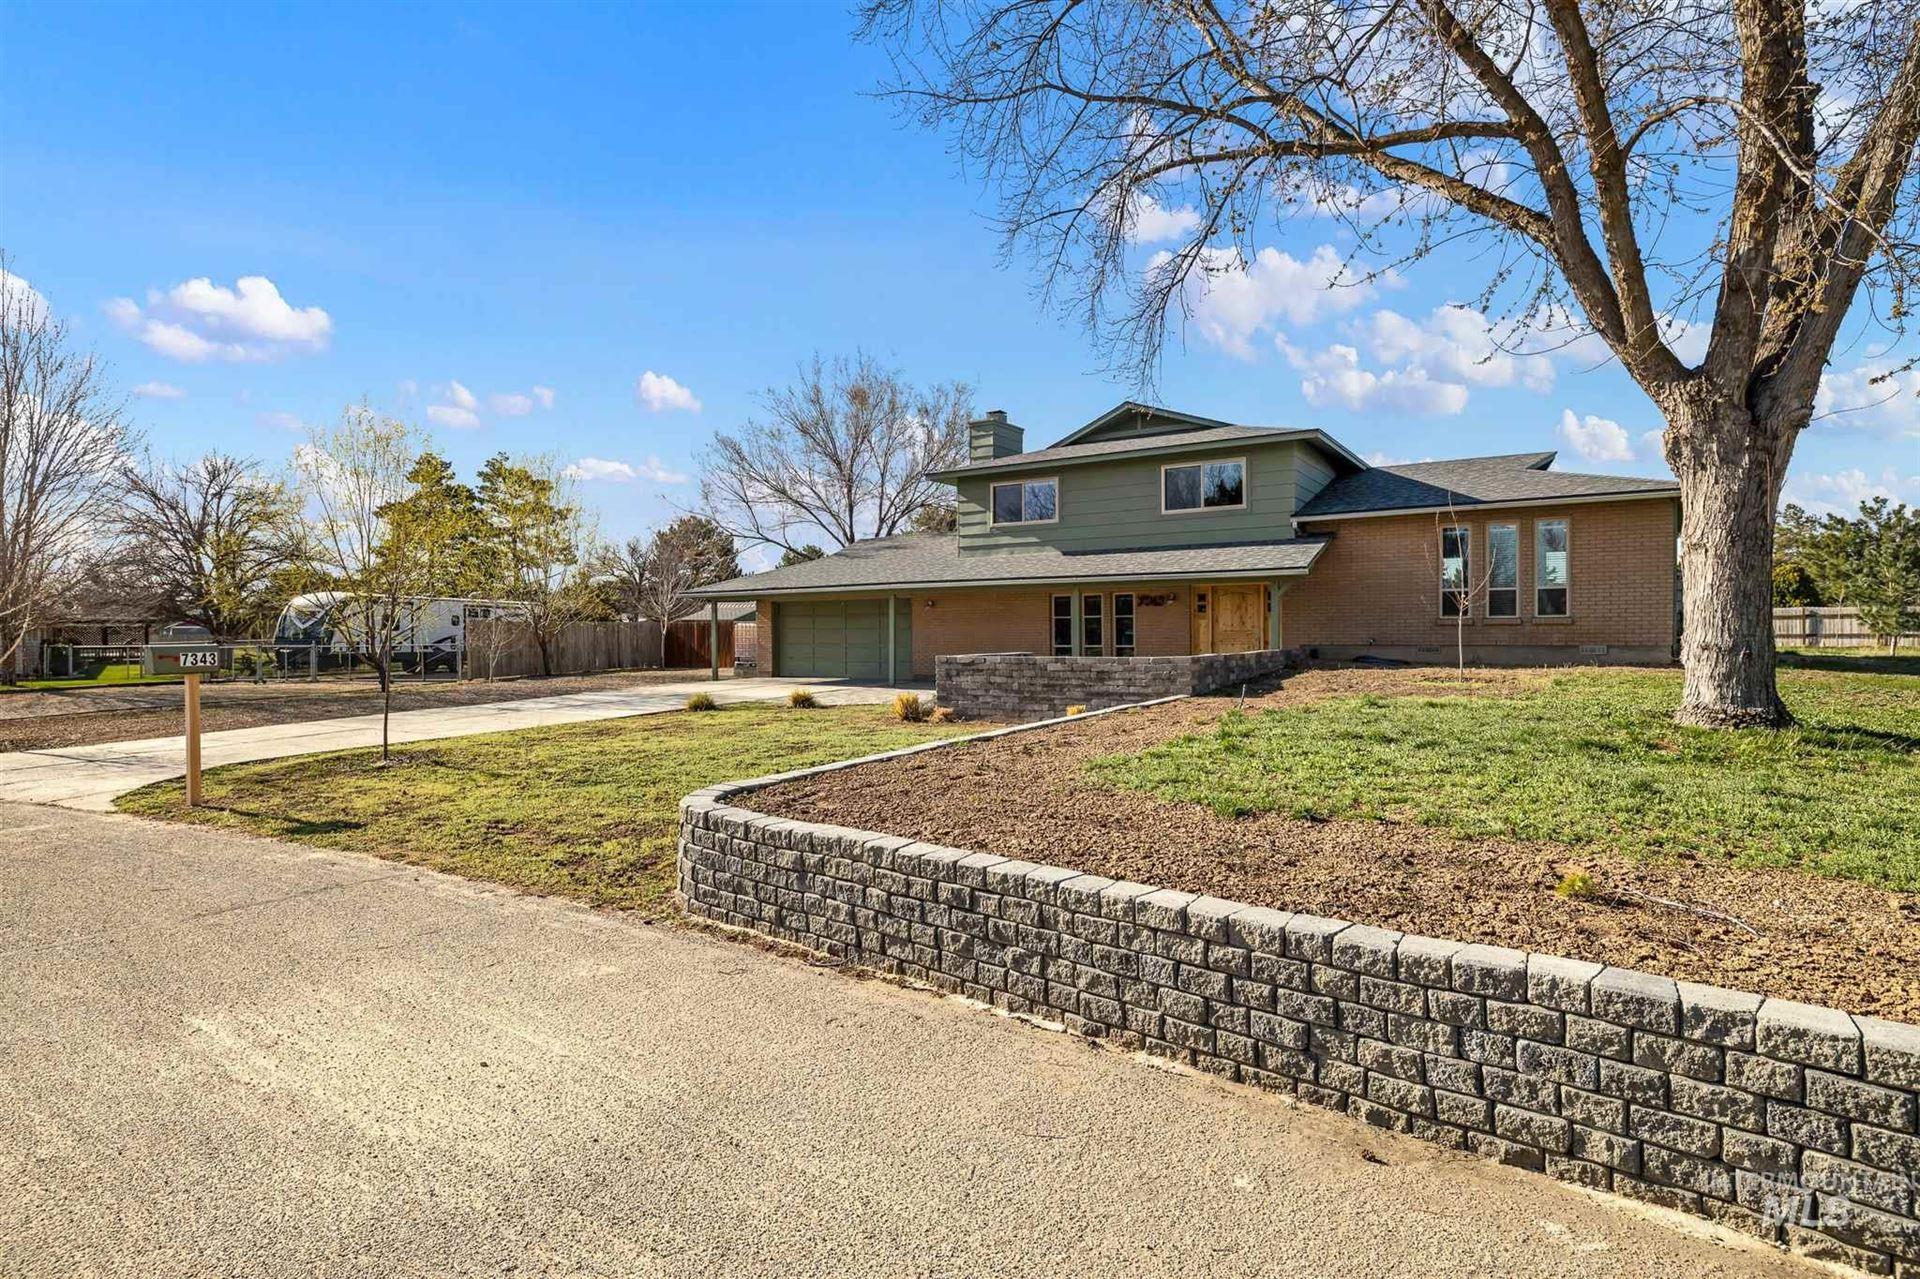 Photo of 7343 S Hilltop Way, Boise, ID 83709 (MLS # 98798377)